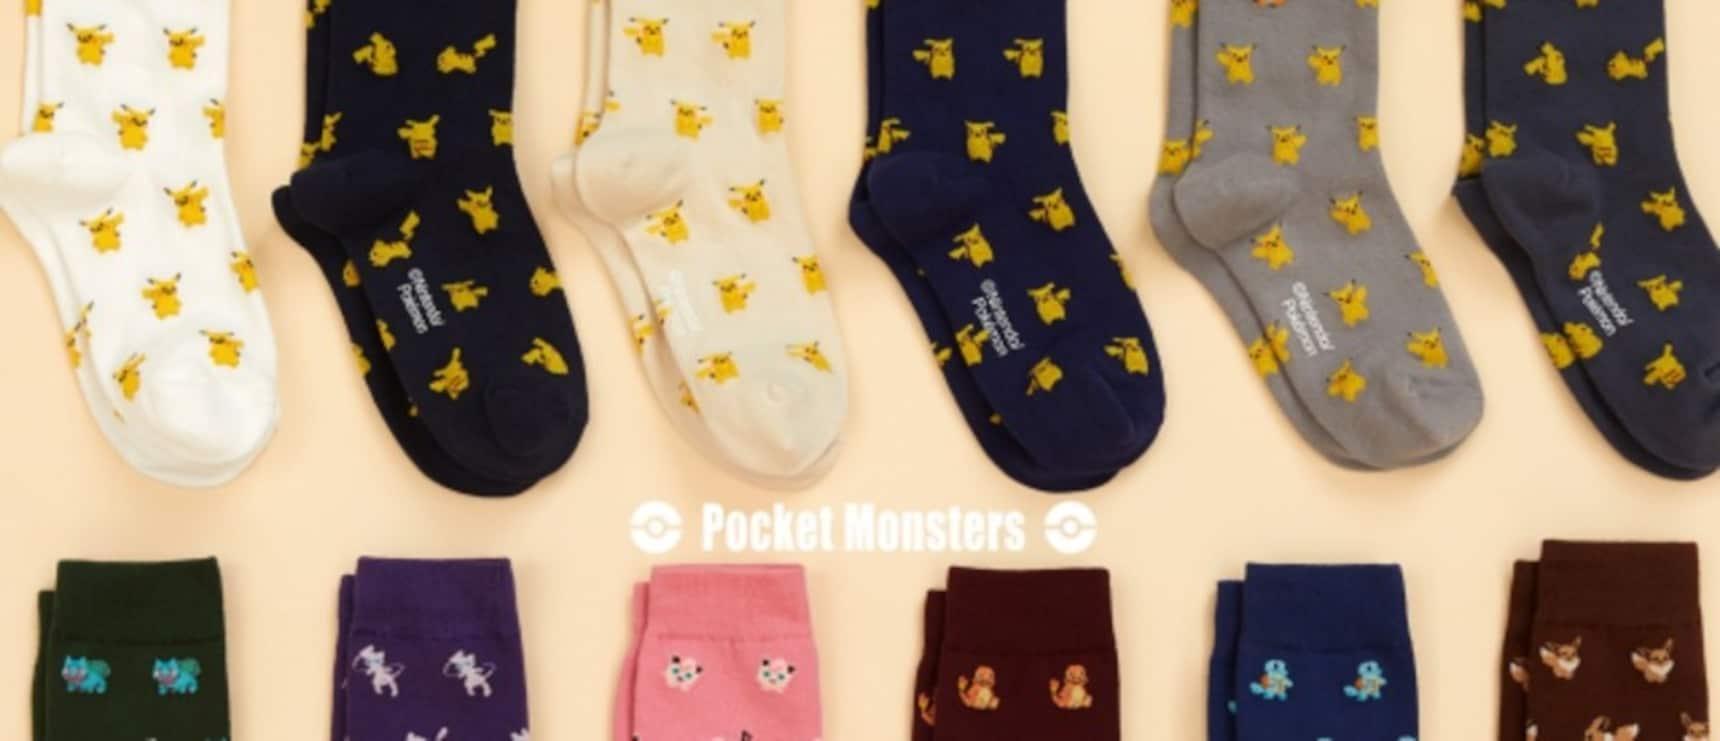 Evolve Your Wardrobe with These Pokémon Socks